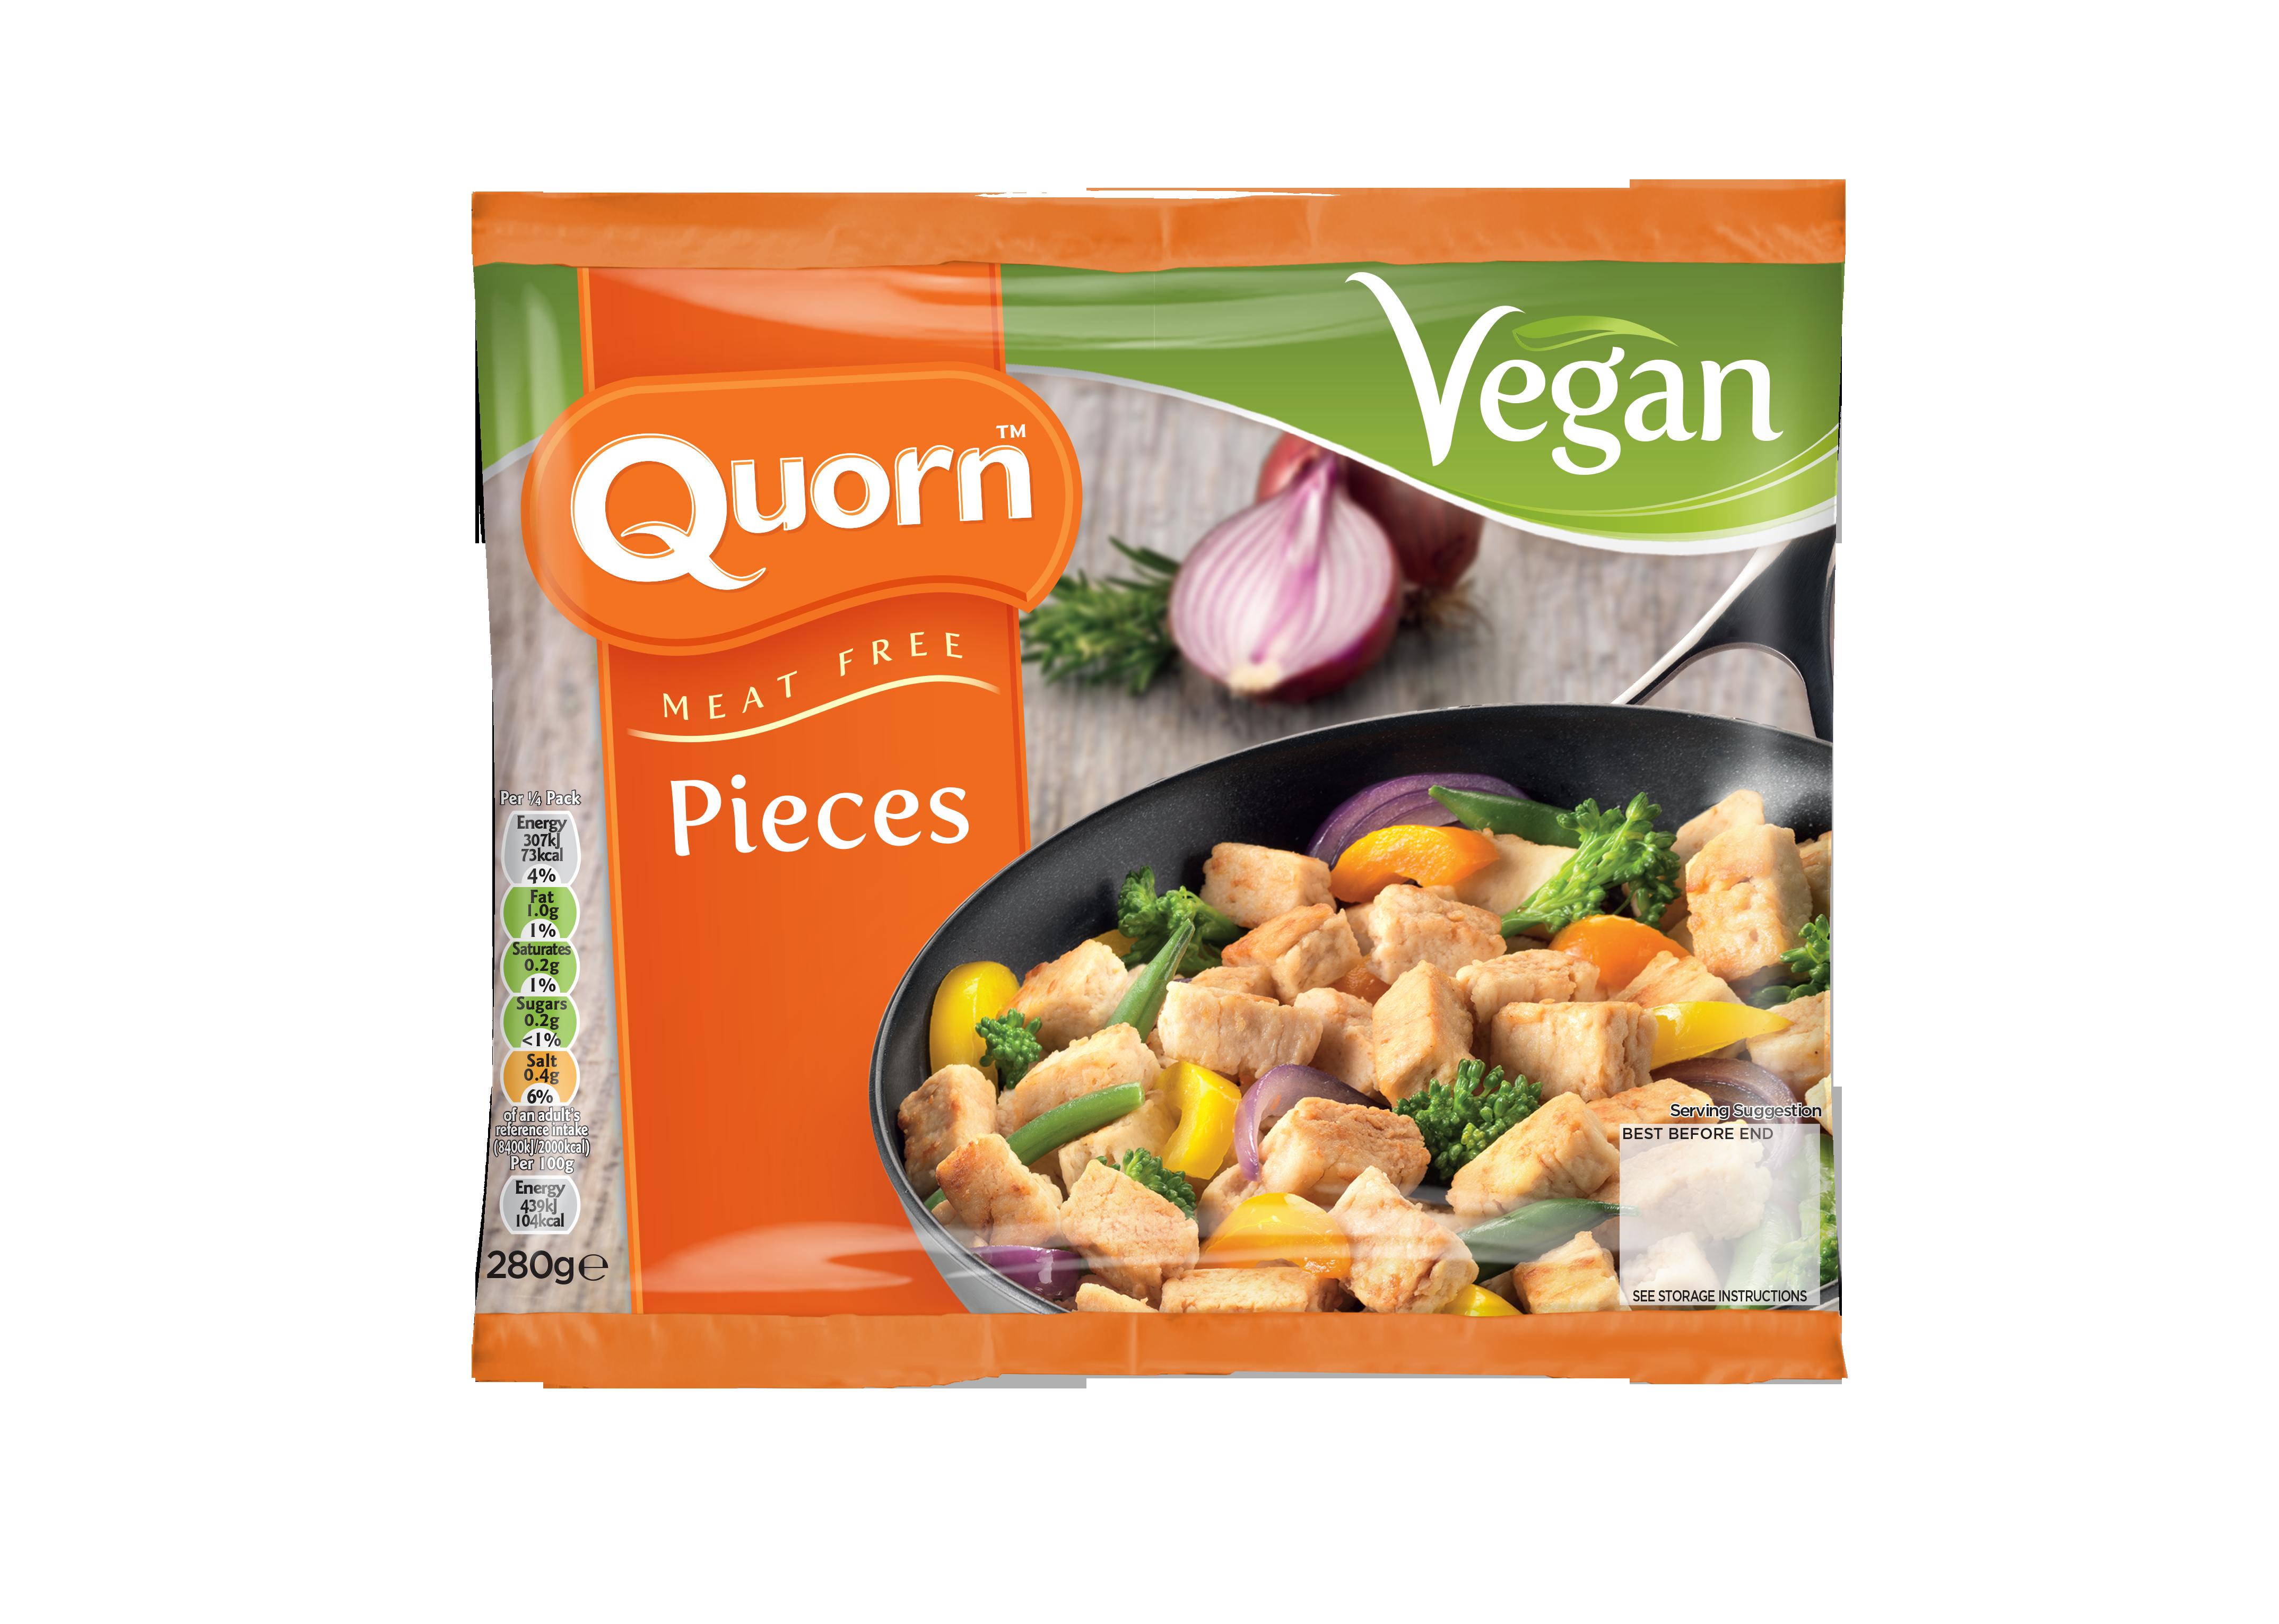 http://fatgayvegan.com/wp-content/uploads/2015/09/Quorn_RD_Vegan_Chicken_Pieces_v1.png